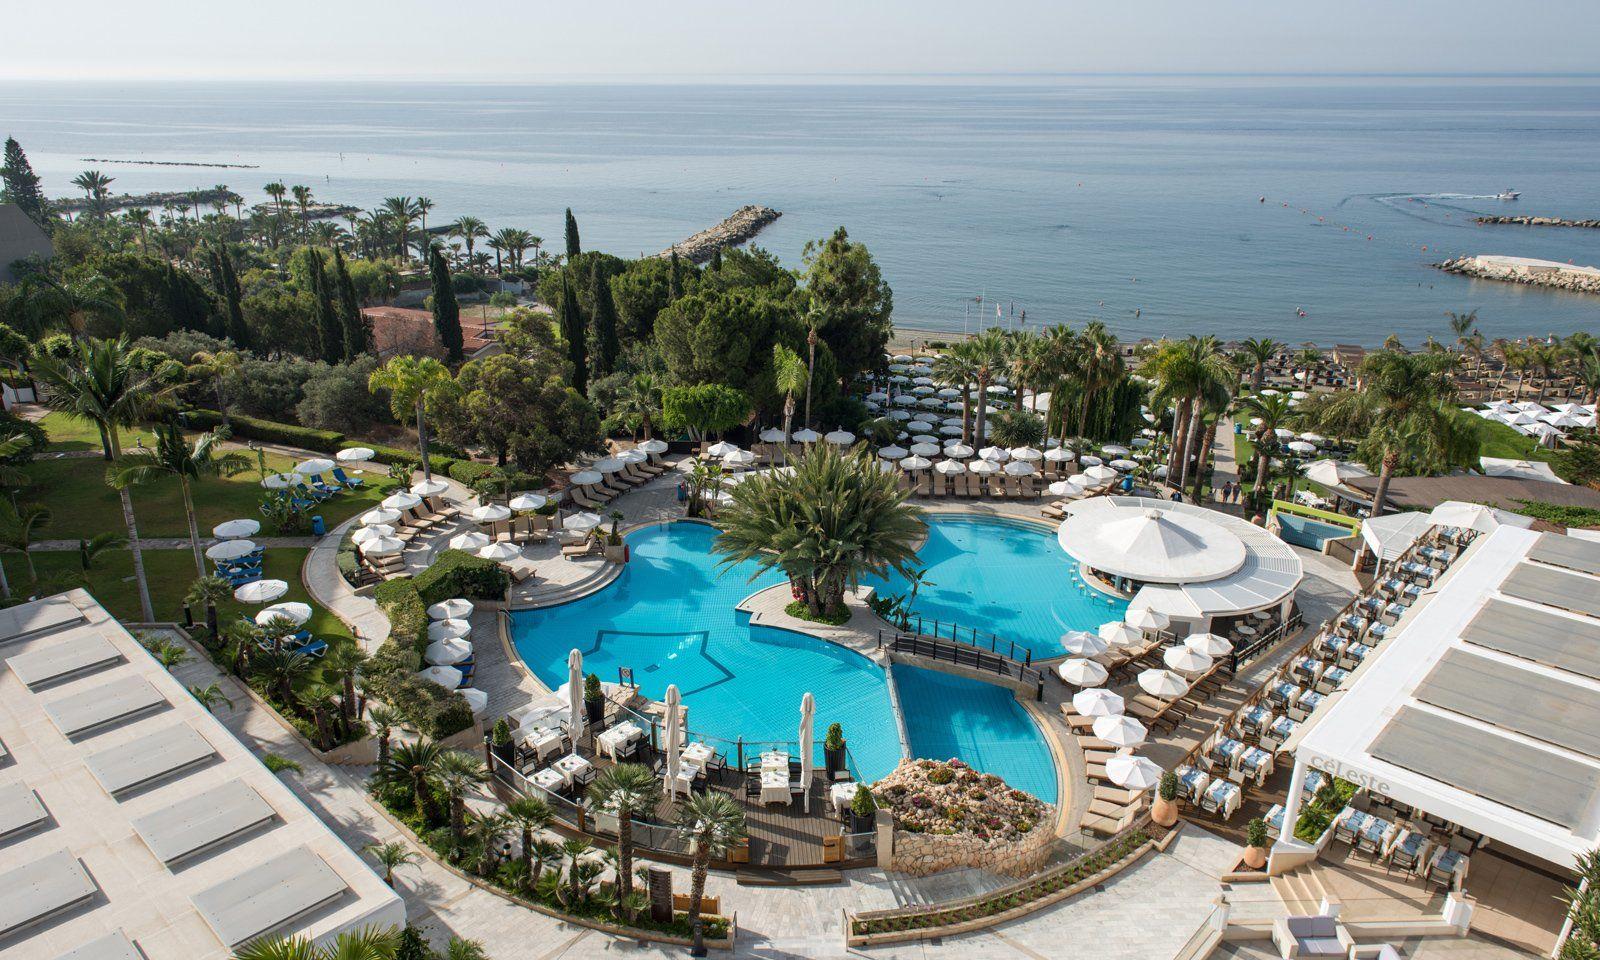 هتل مدیترینین بیچ لیماسول